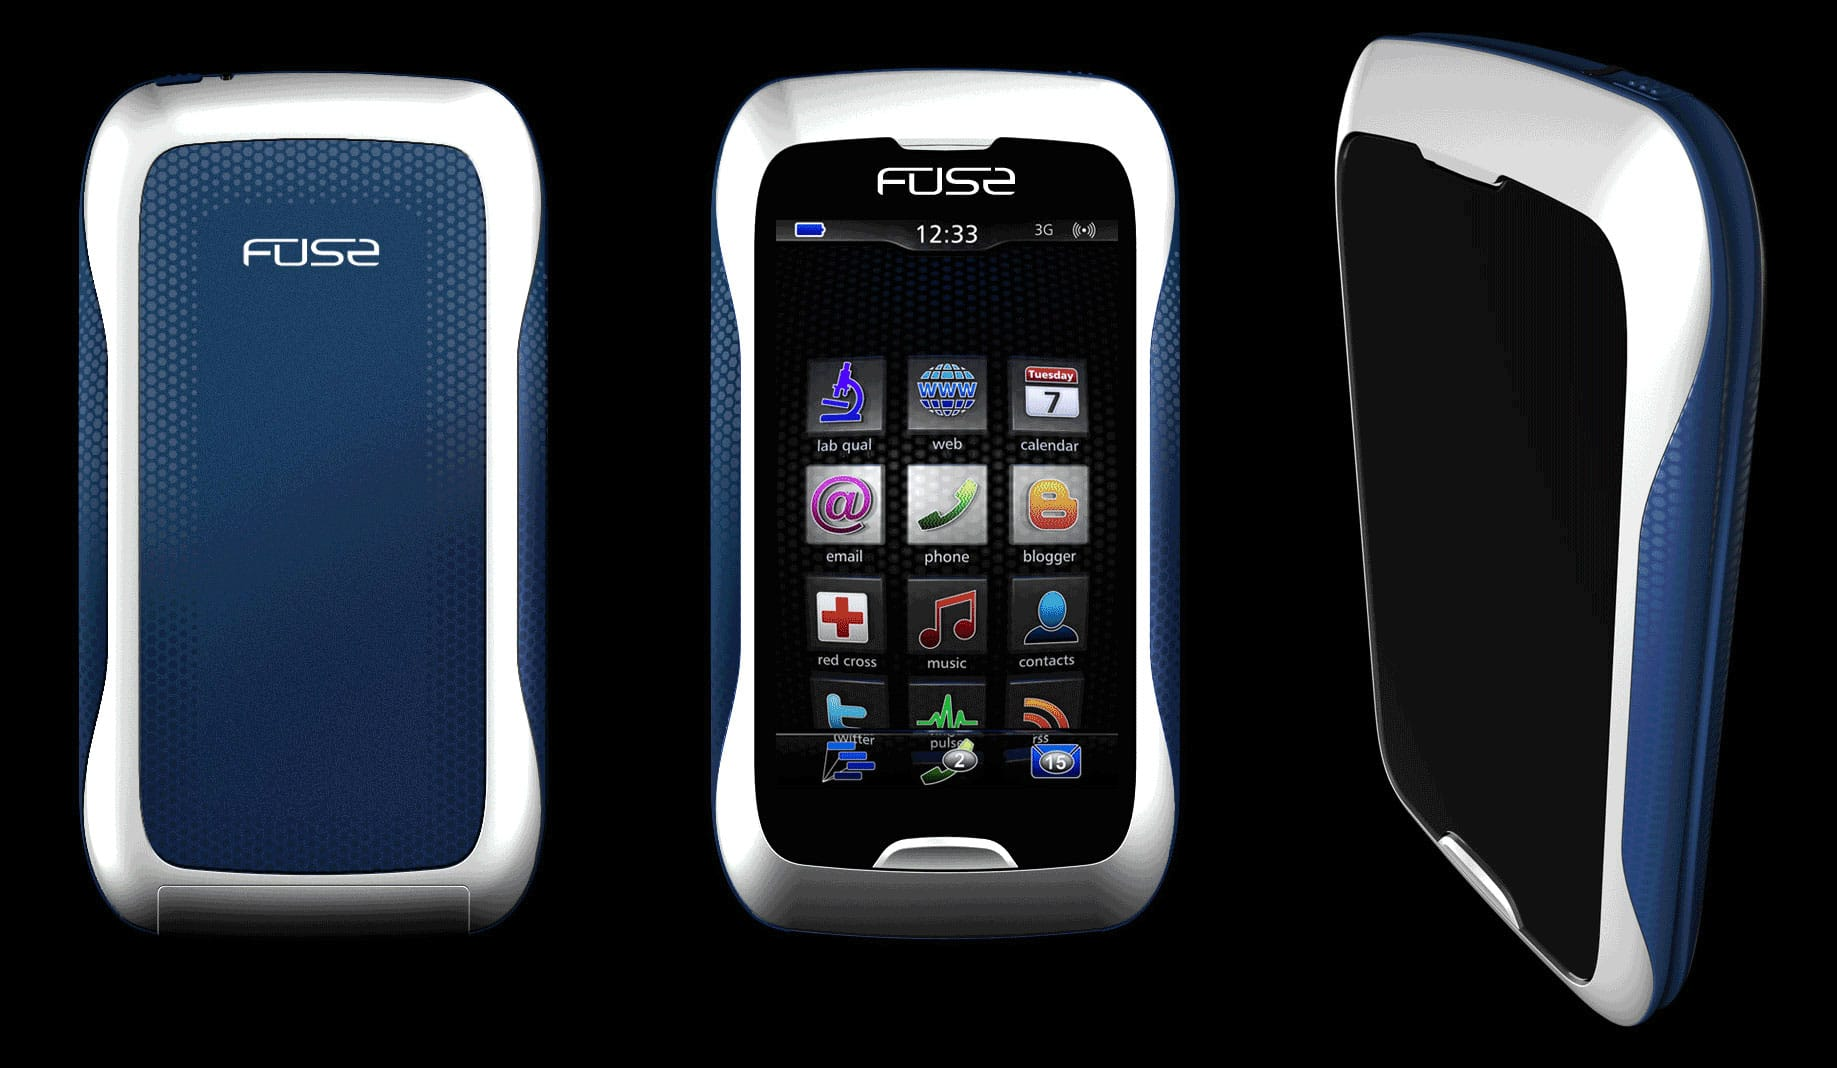 Fuse - Concept Phone